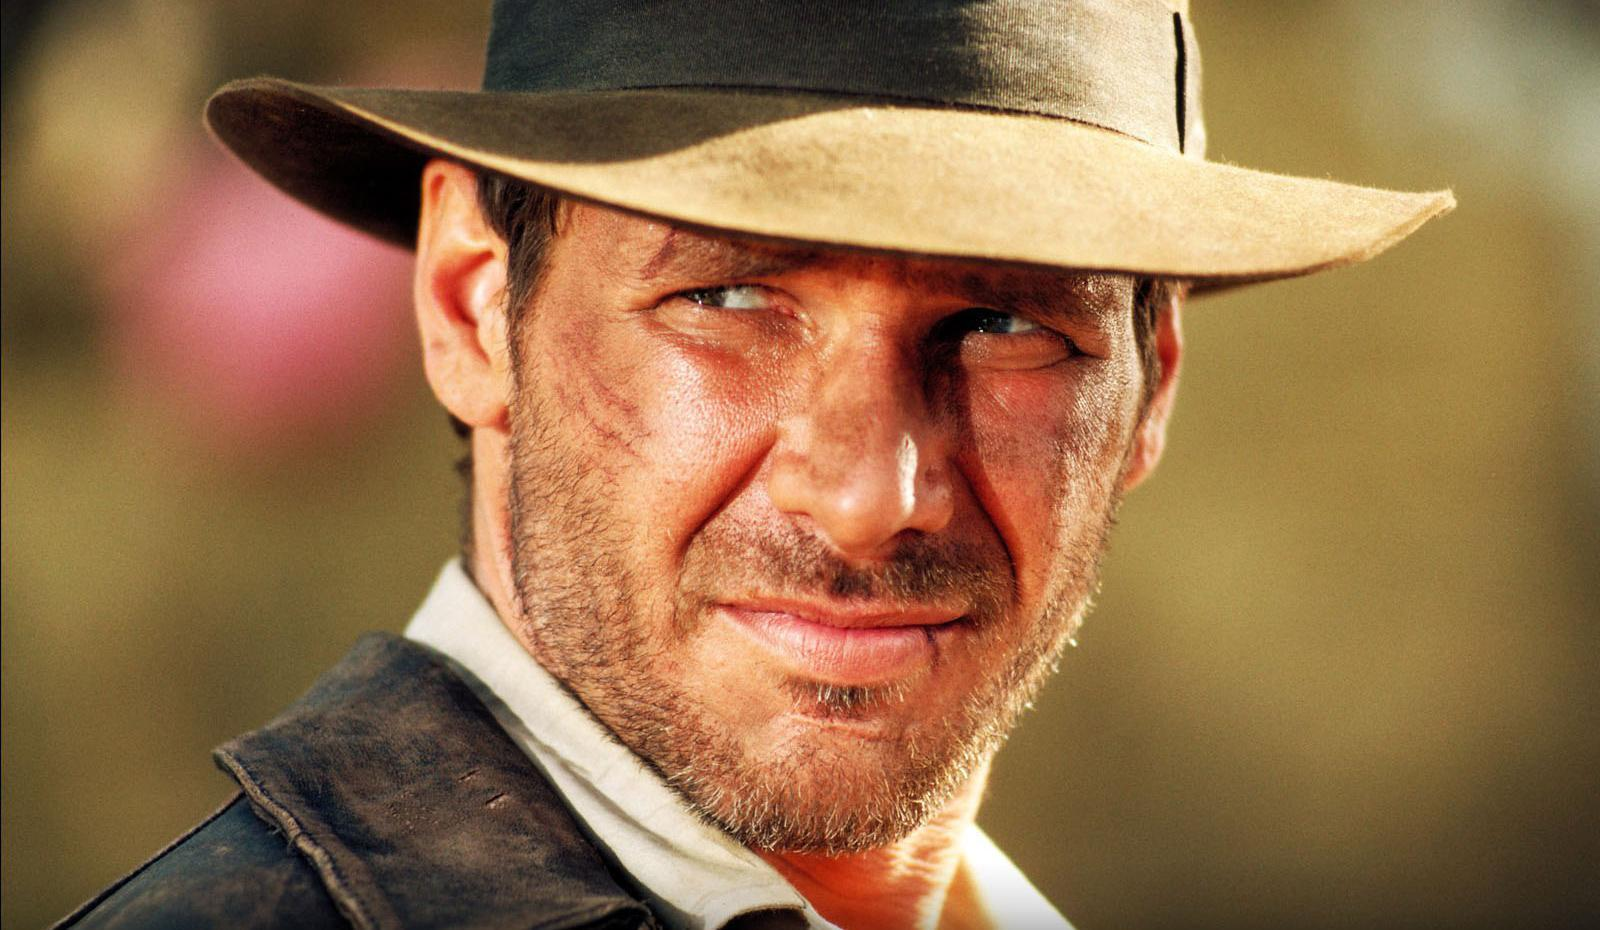 Indiana Jones, the epitome of individualism